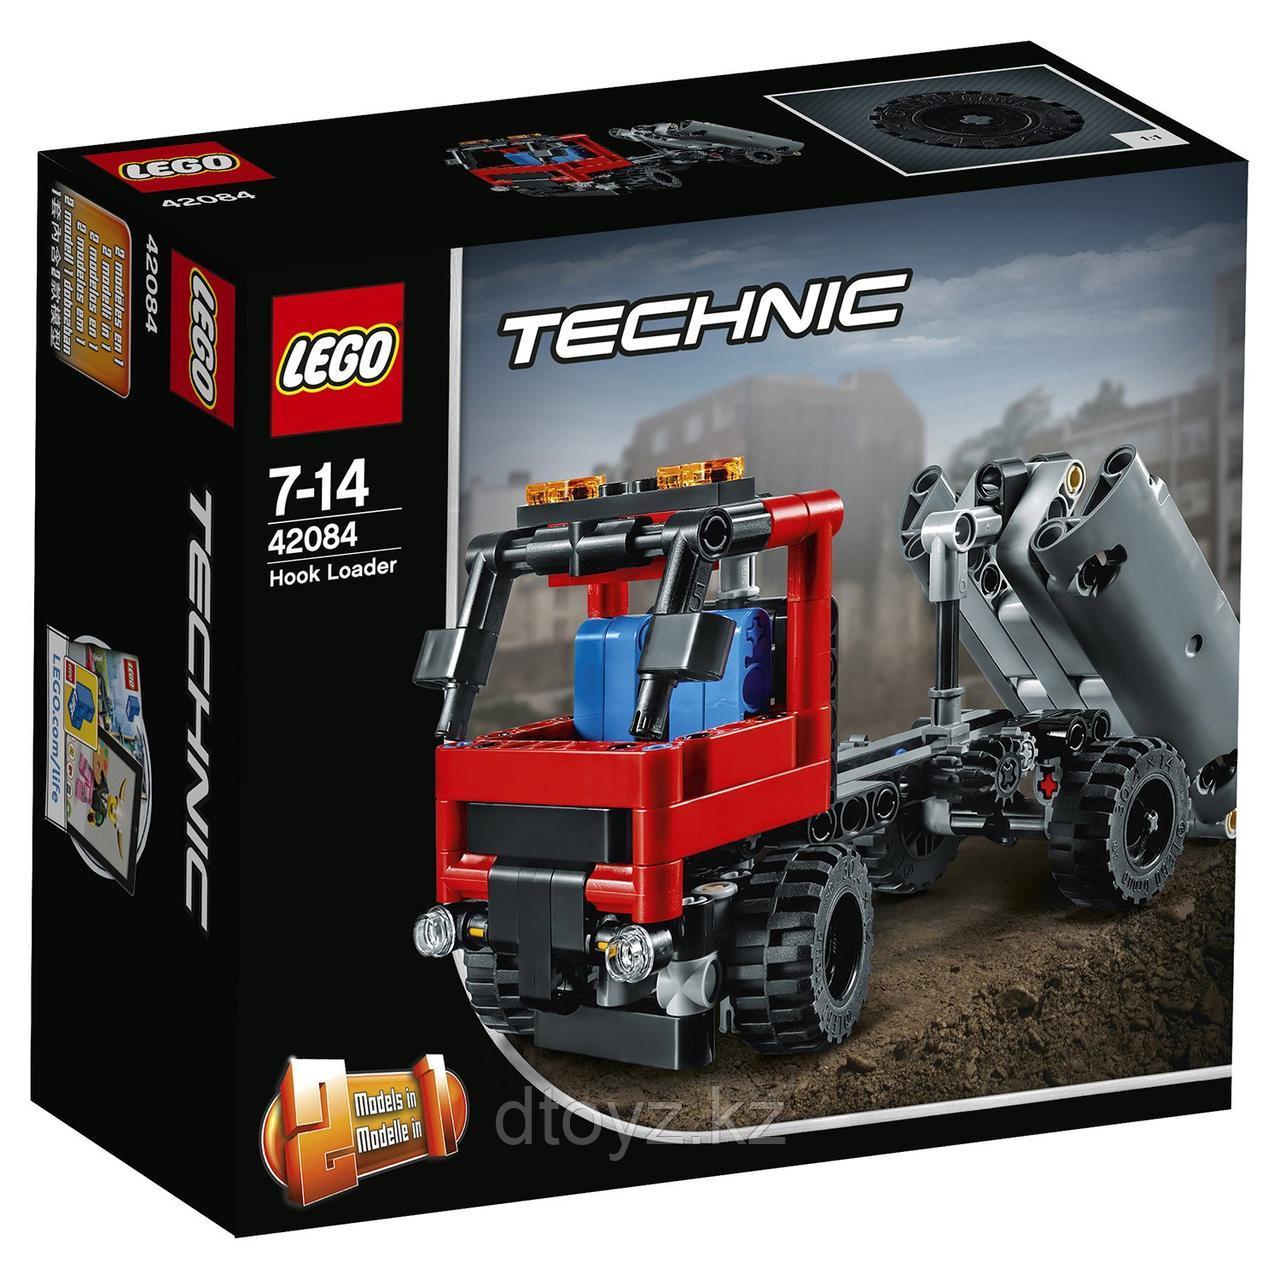 Lego Technic 42084 Погрузчик, Лего Техник